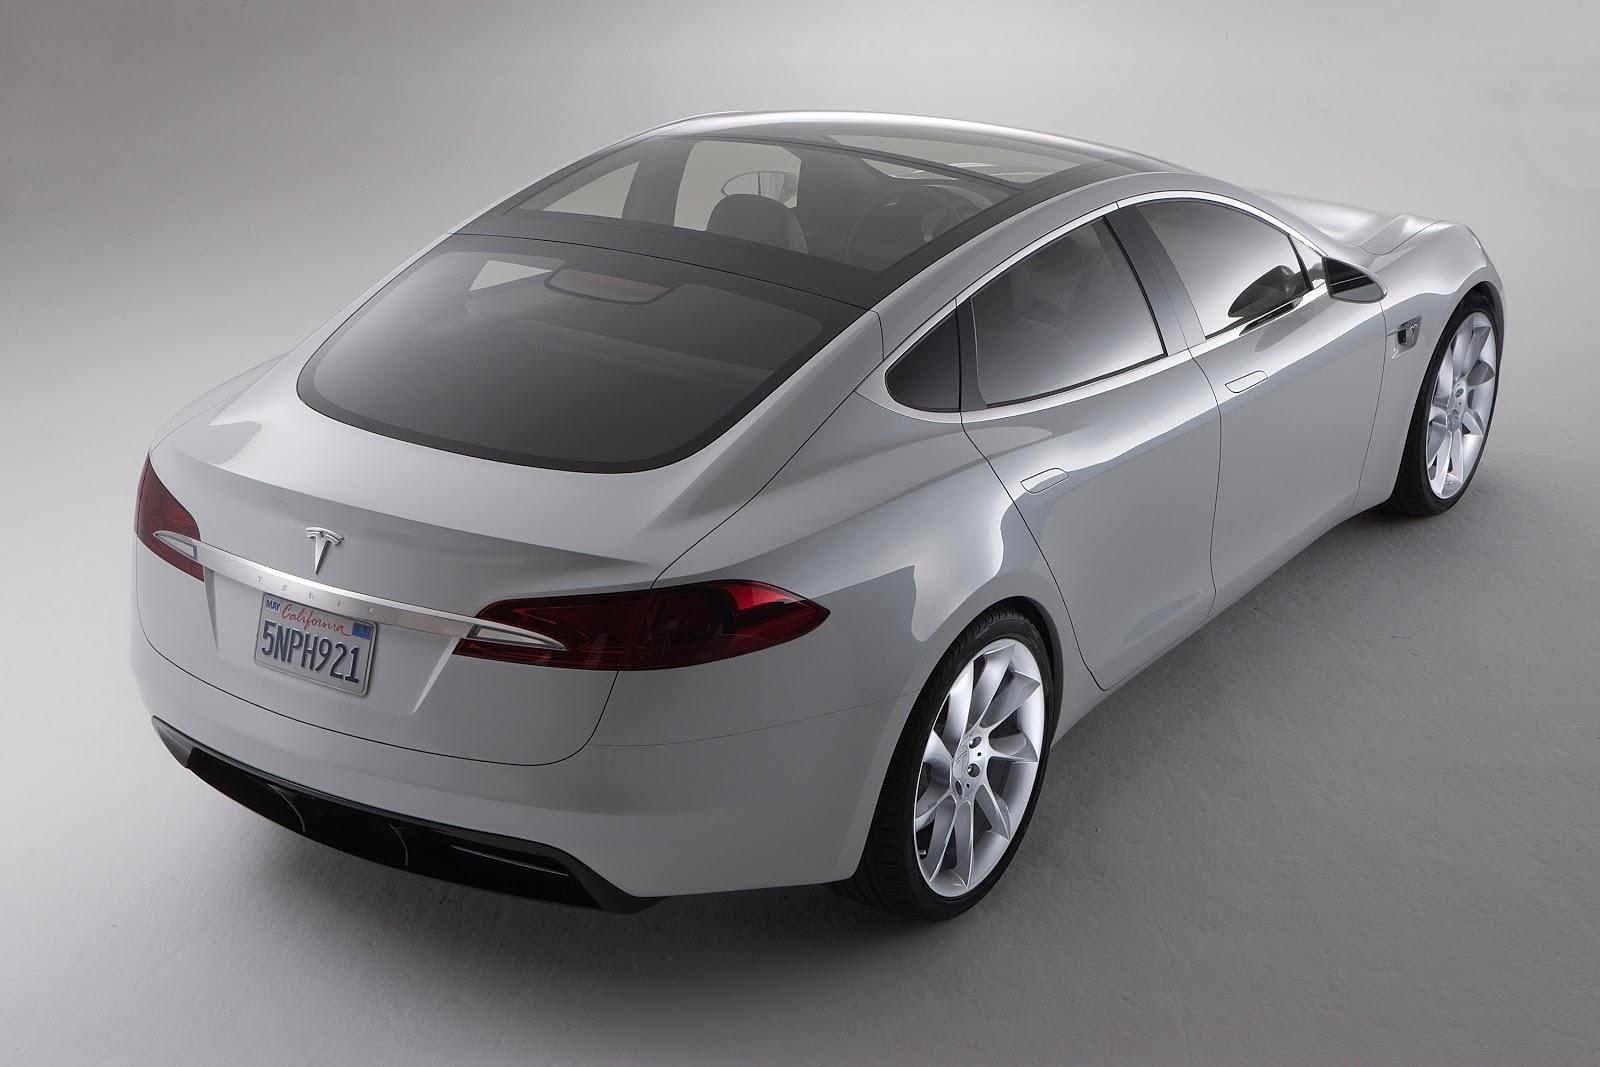 Cars GTO: Tesla Model S Goes to Europe